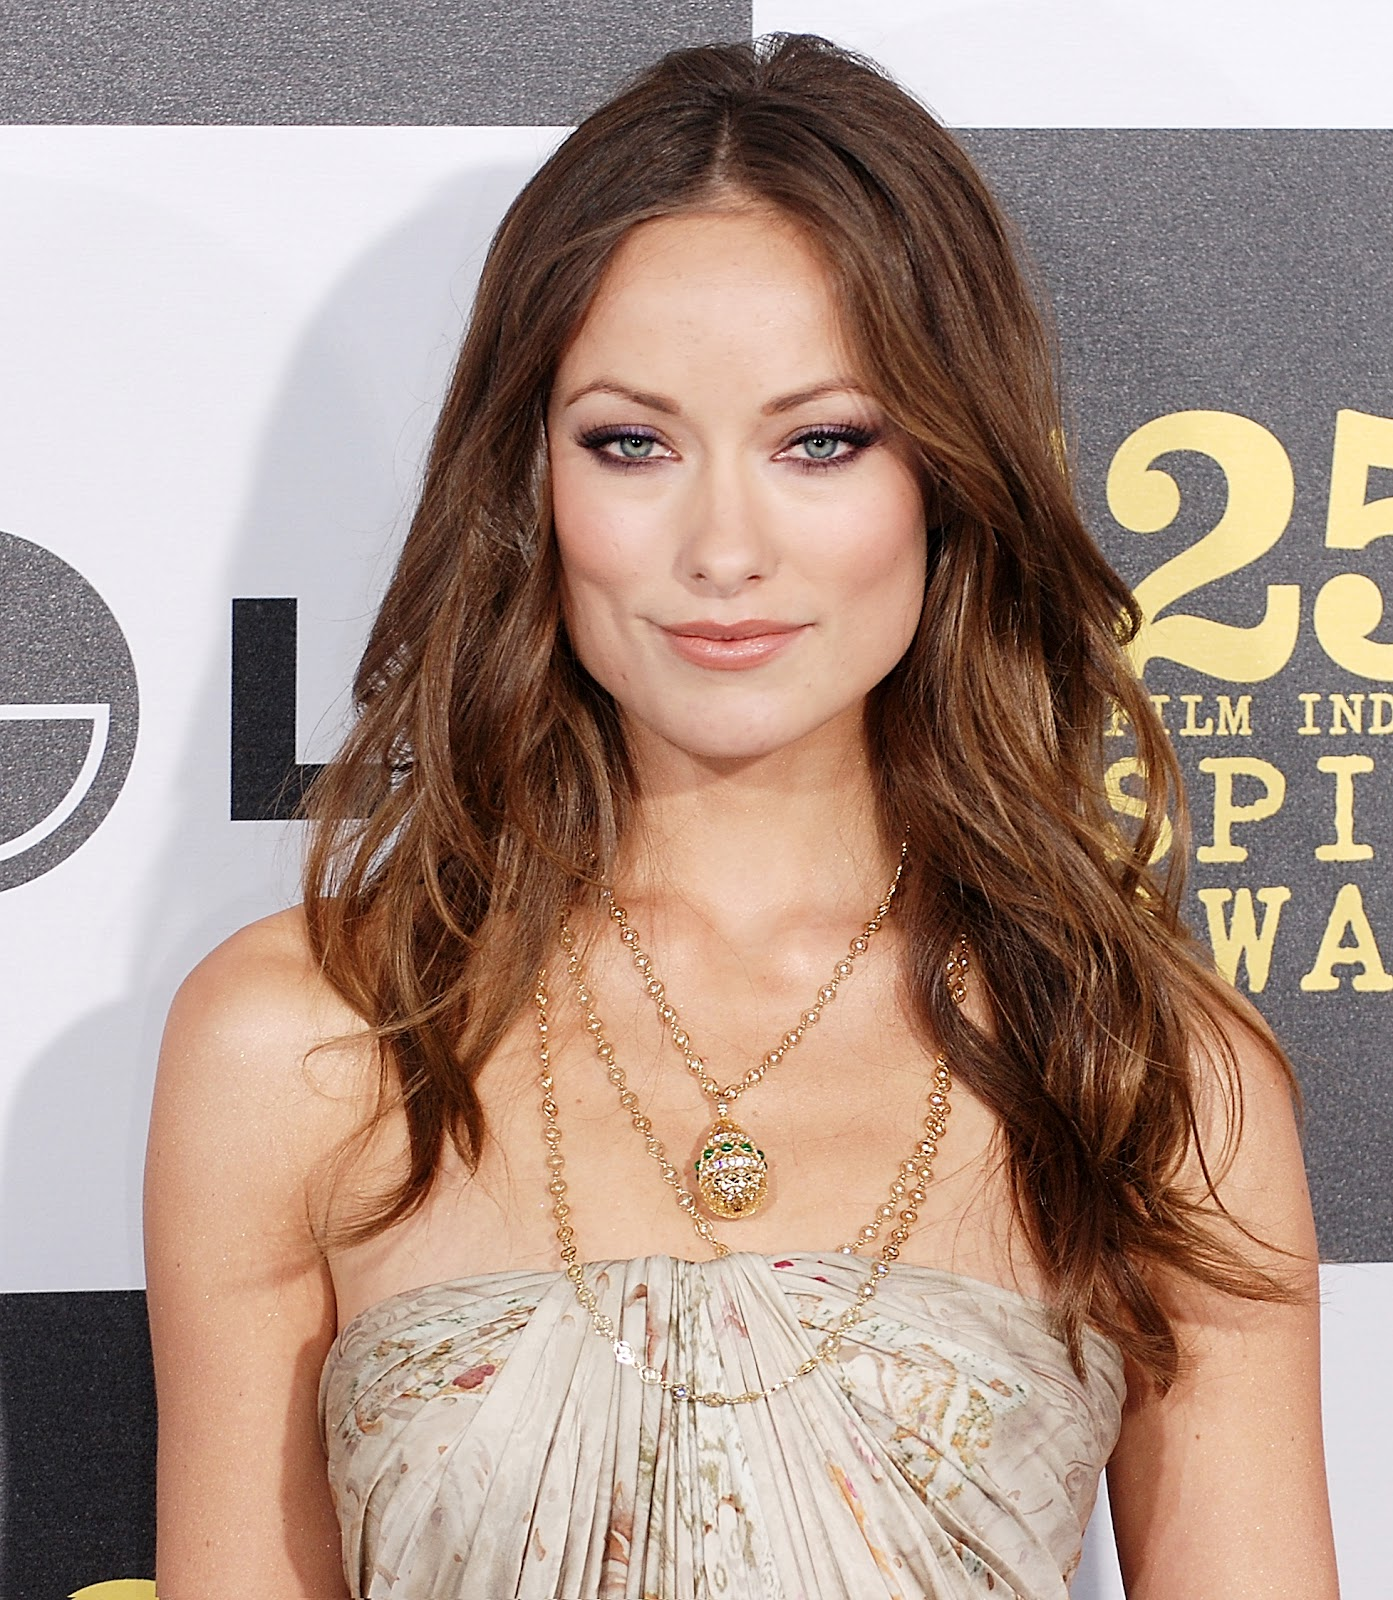 http://2.bp.blogspot.com/-KaZfdKvRs2U/T-SJ7XZrZaI/AAAAAAAAAgE/D_9Gln57FBU/s1600/Olivia_Wilde_in_2010_Independent_Spirit_Awards.jpg